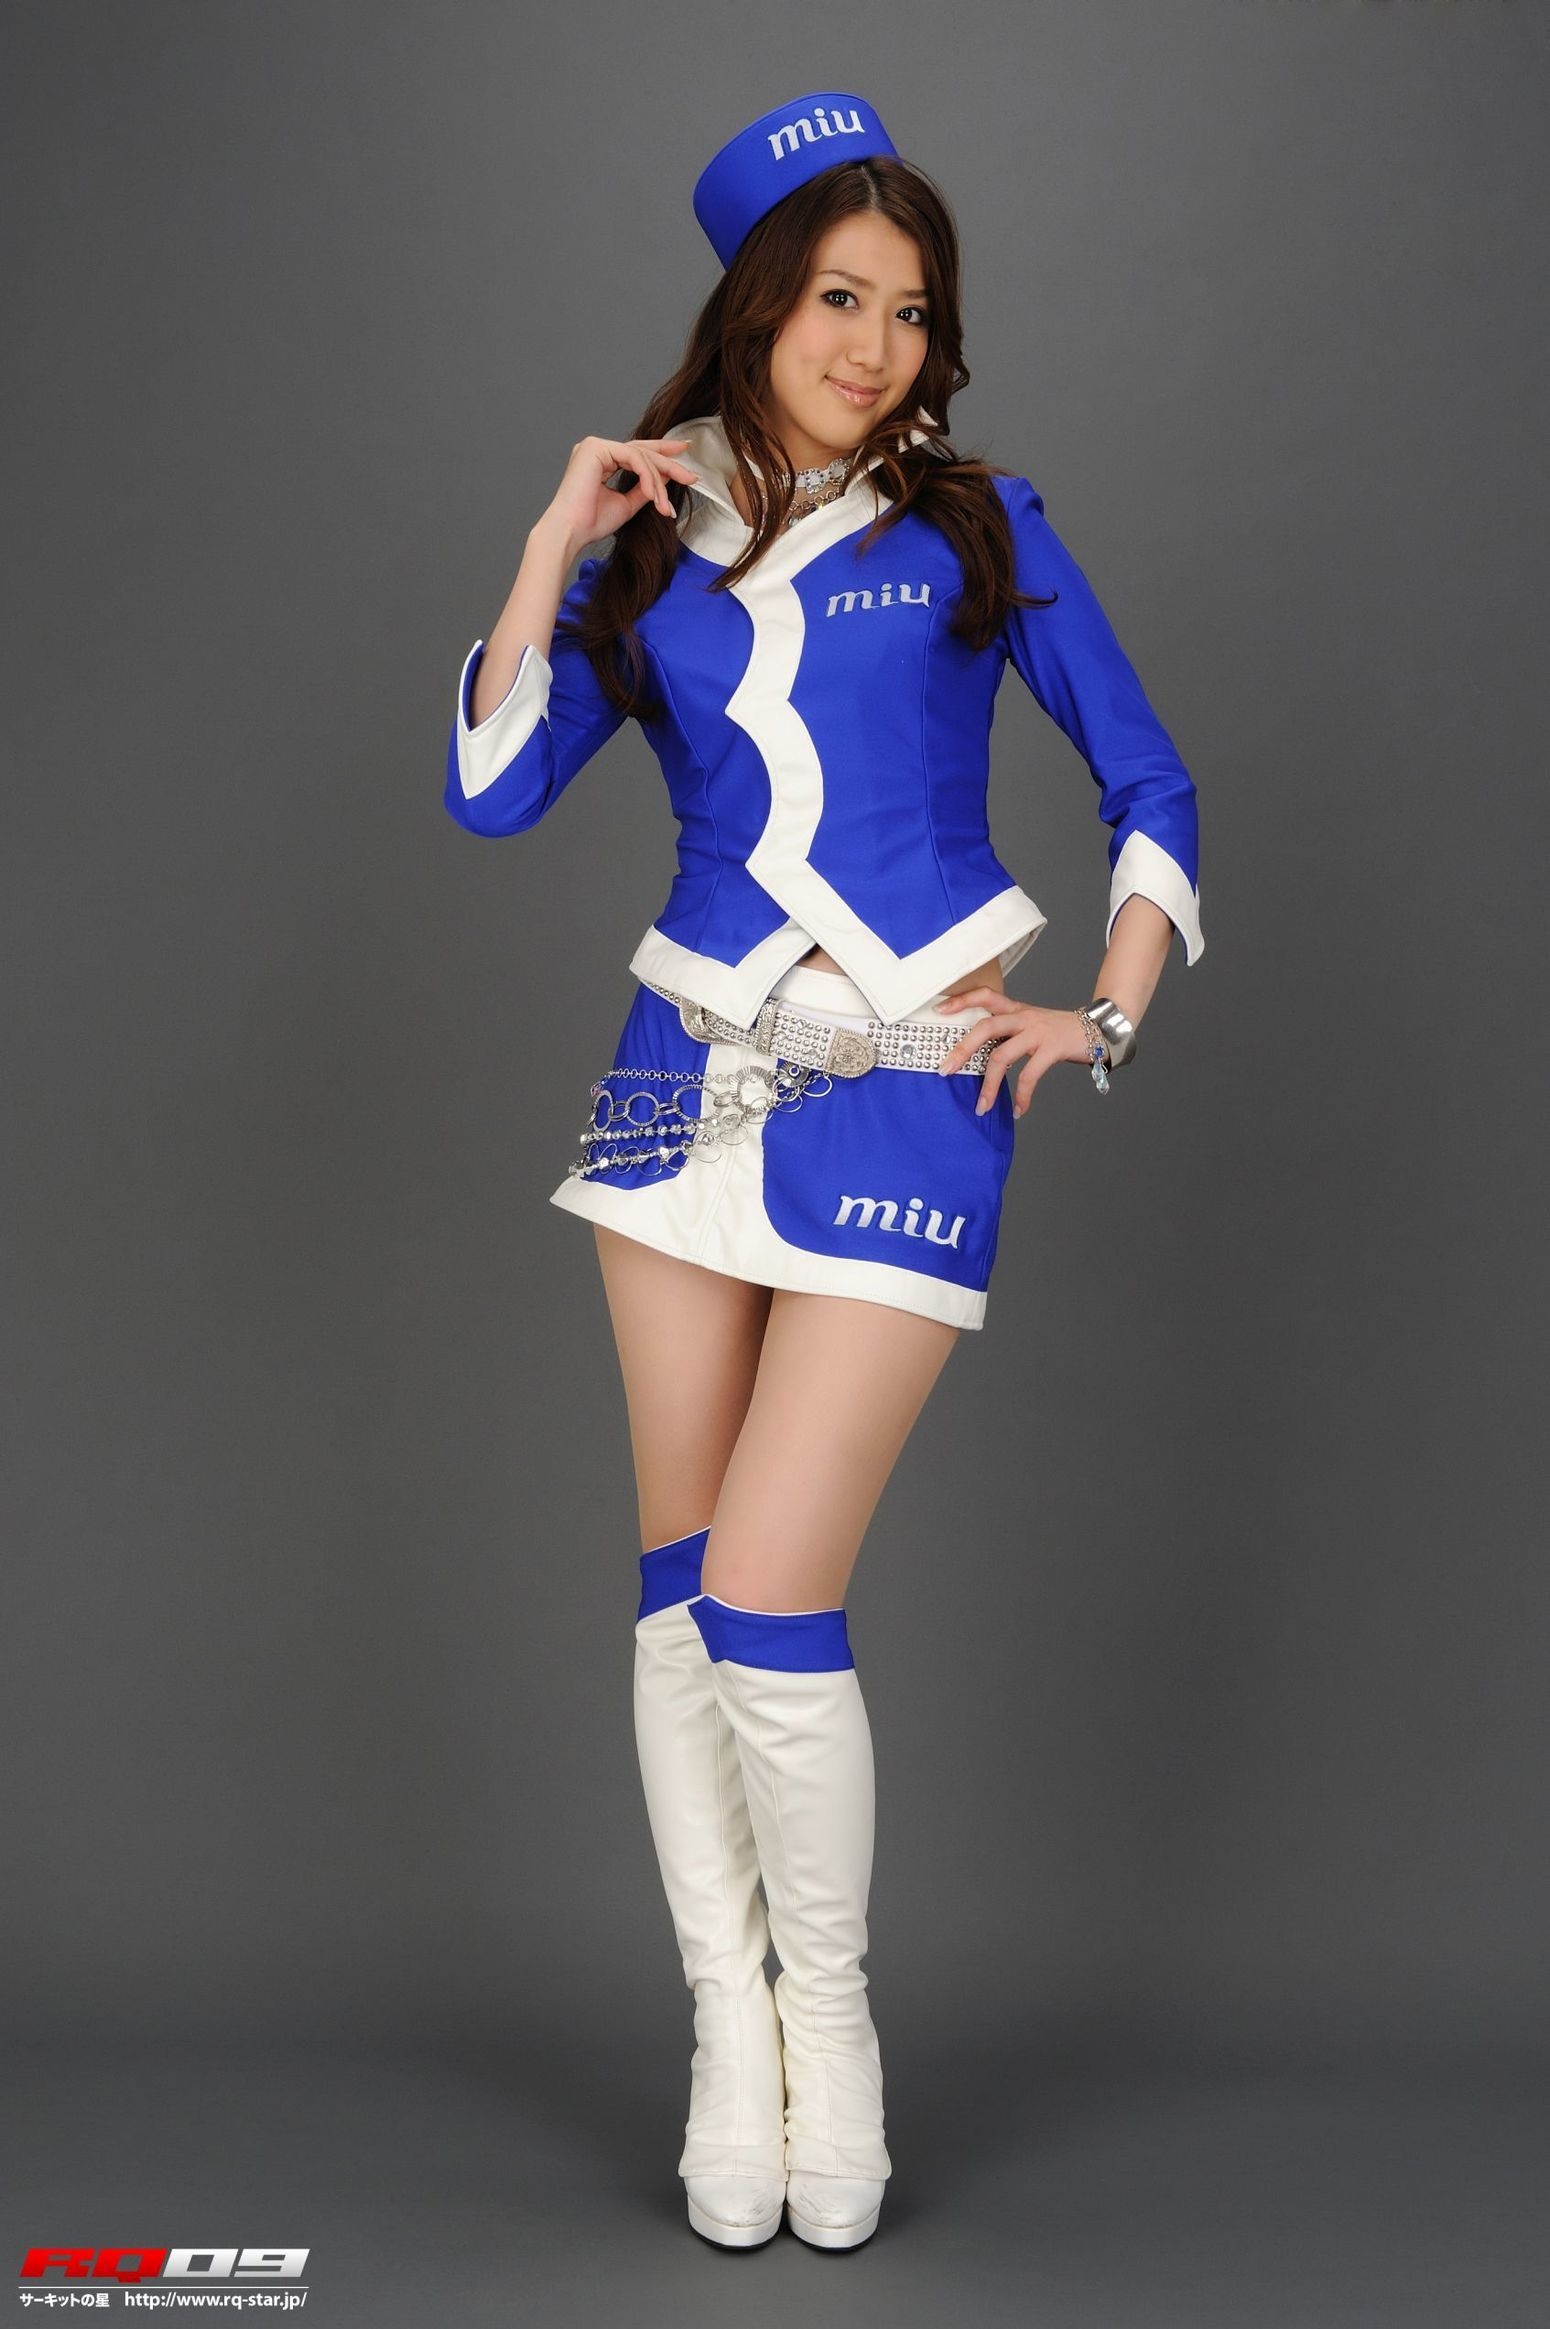 [RQ-STAR] NO.00234 Yuuka Sugisawa 杉泽友香 Race Queen 写真集2